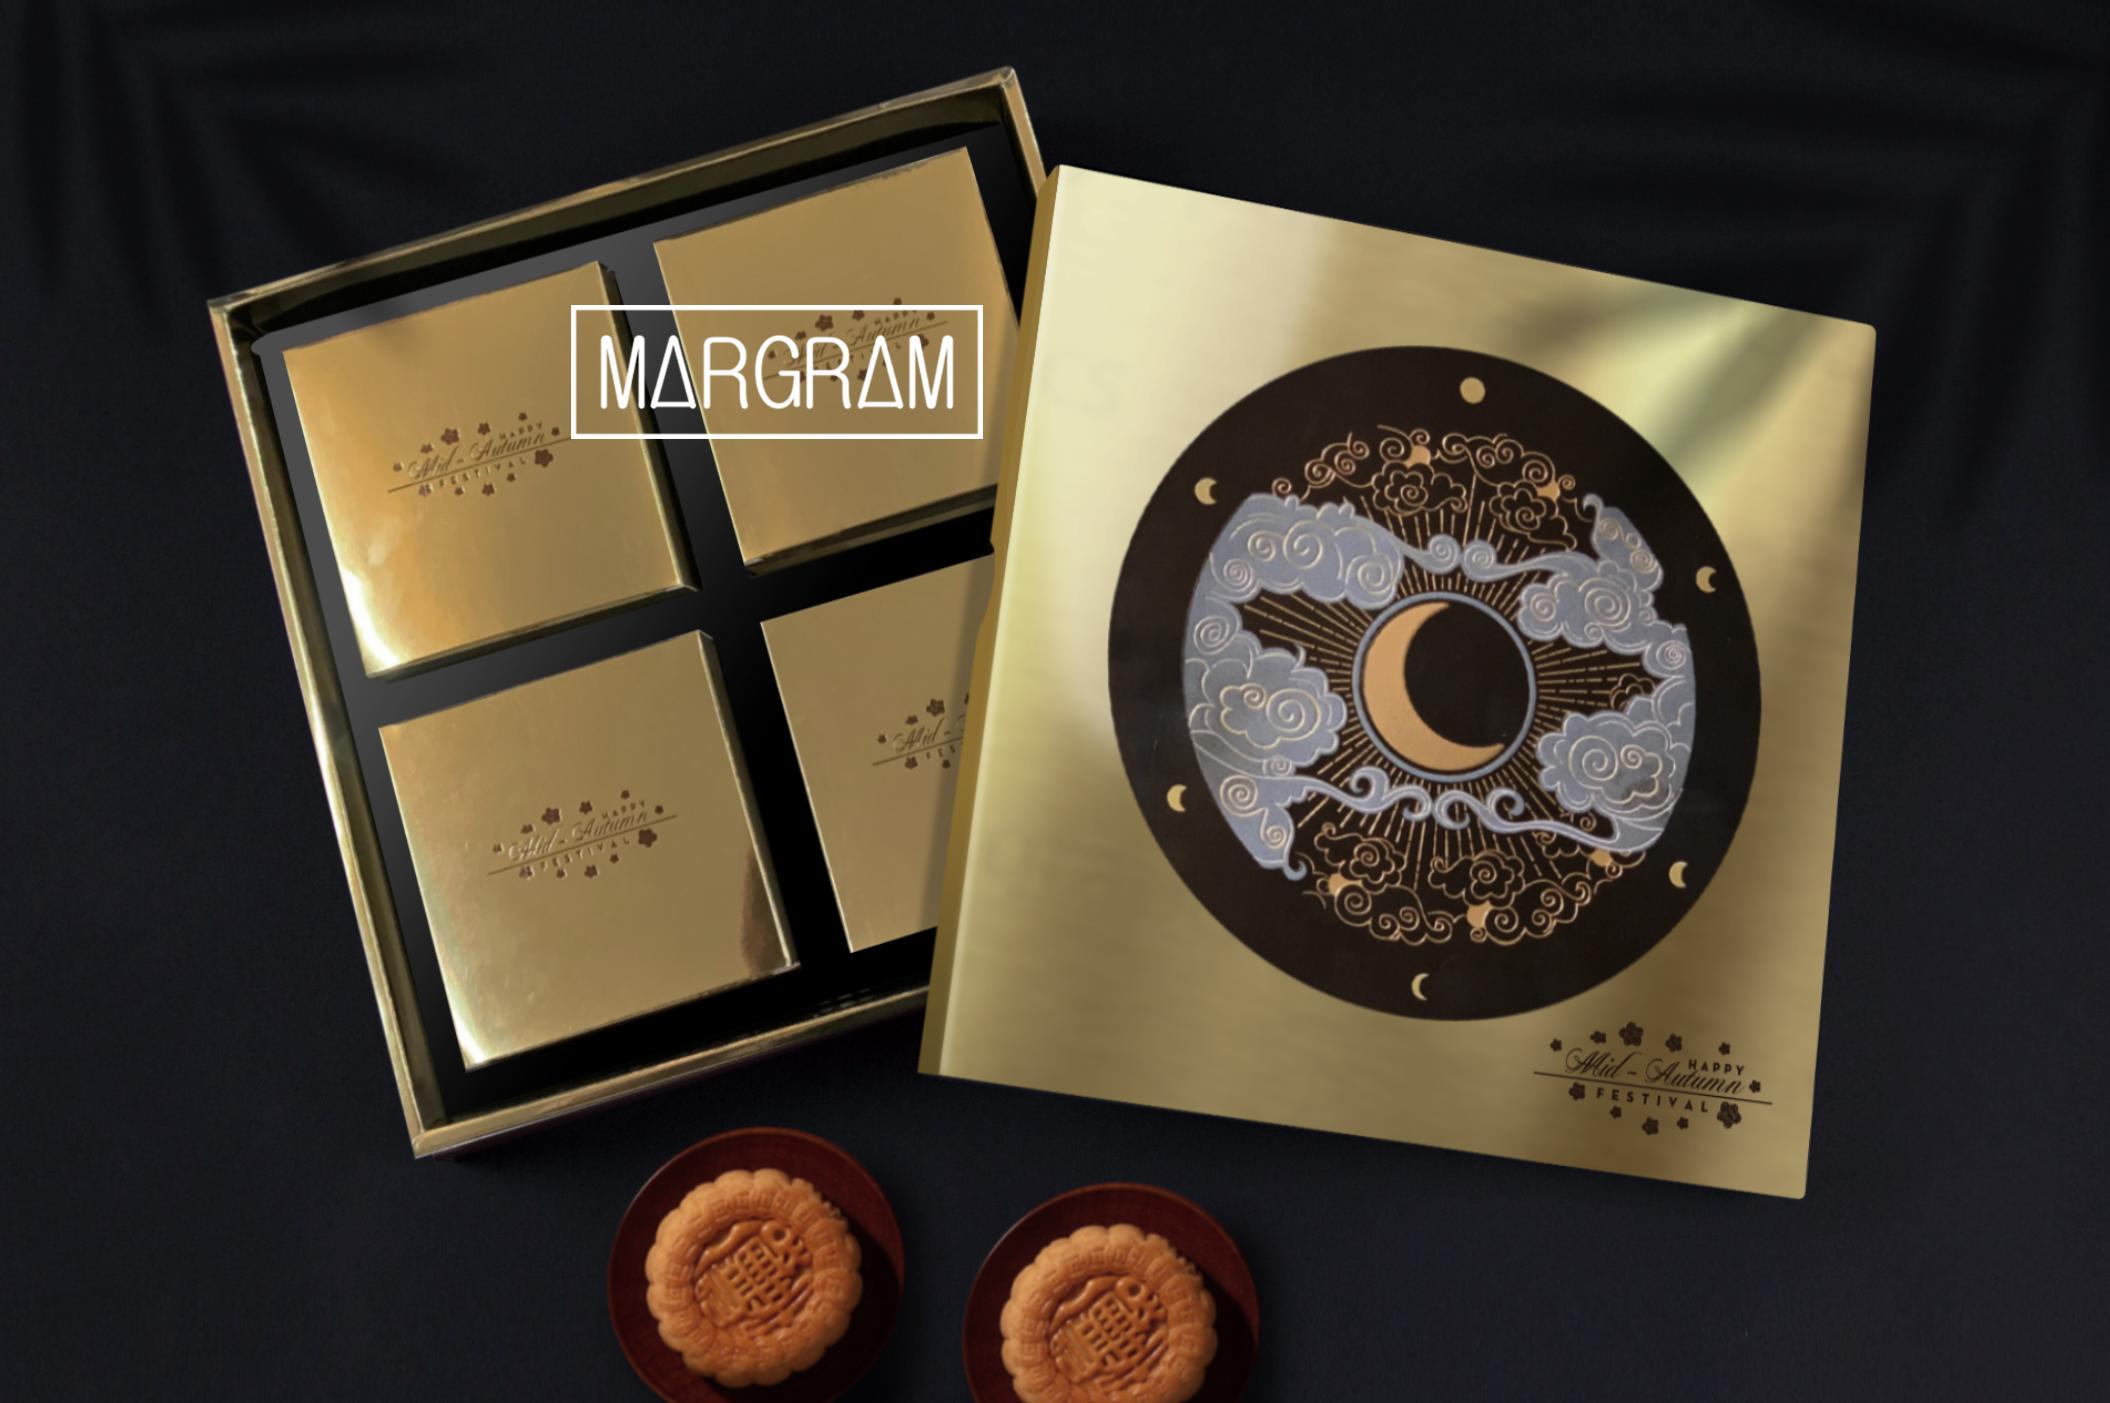 hop-banh-trung-thu-thu-vong-nguyet-margram-2